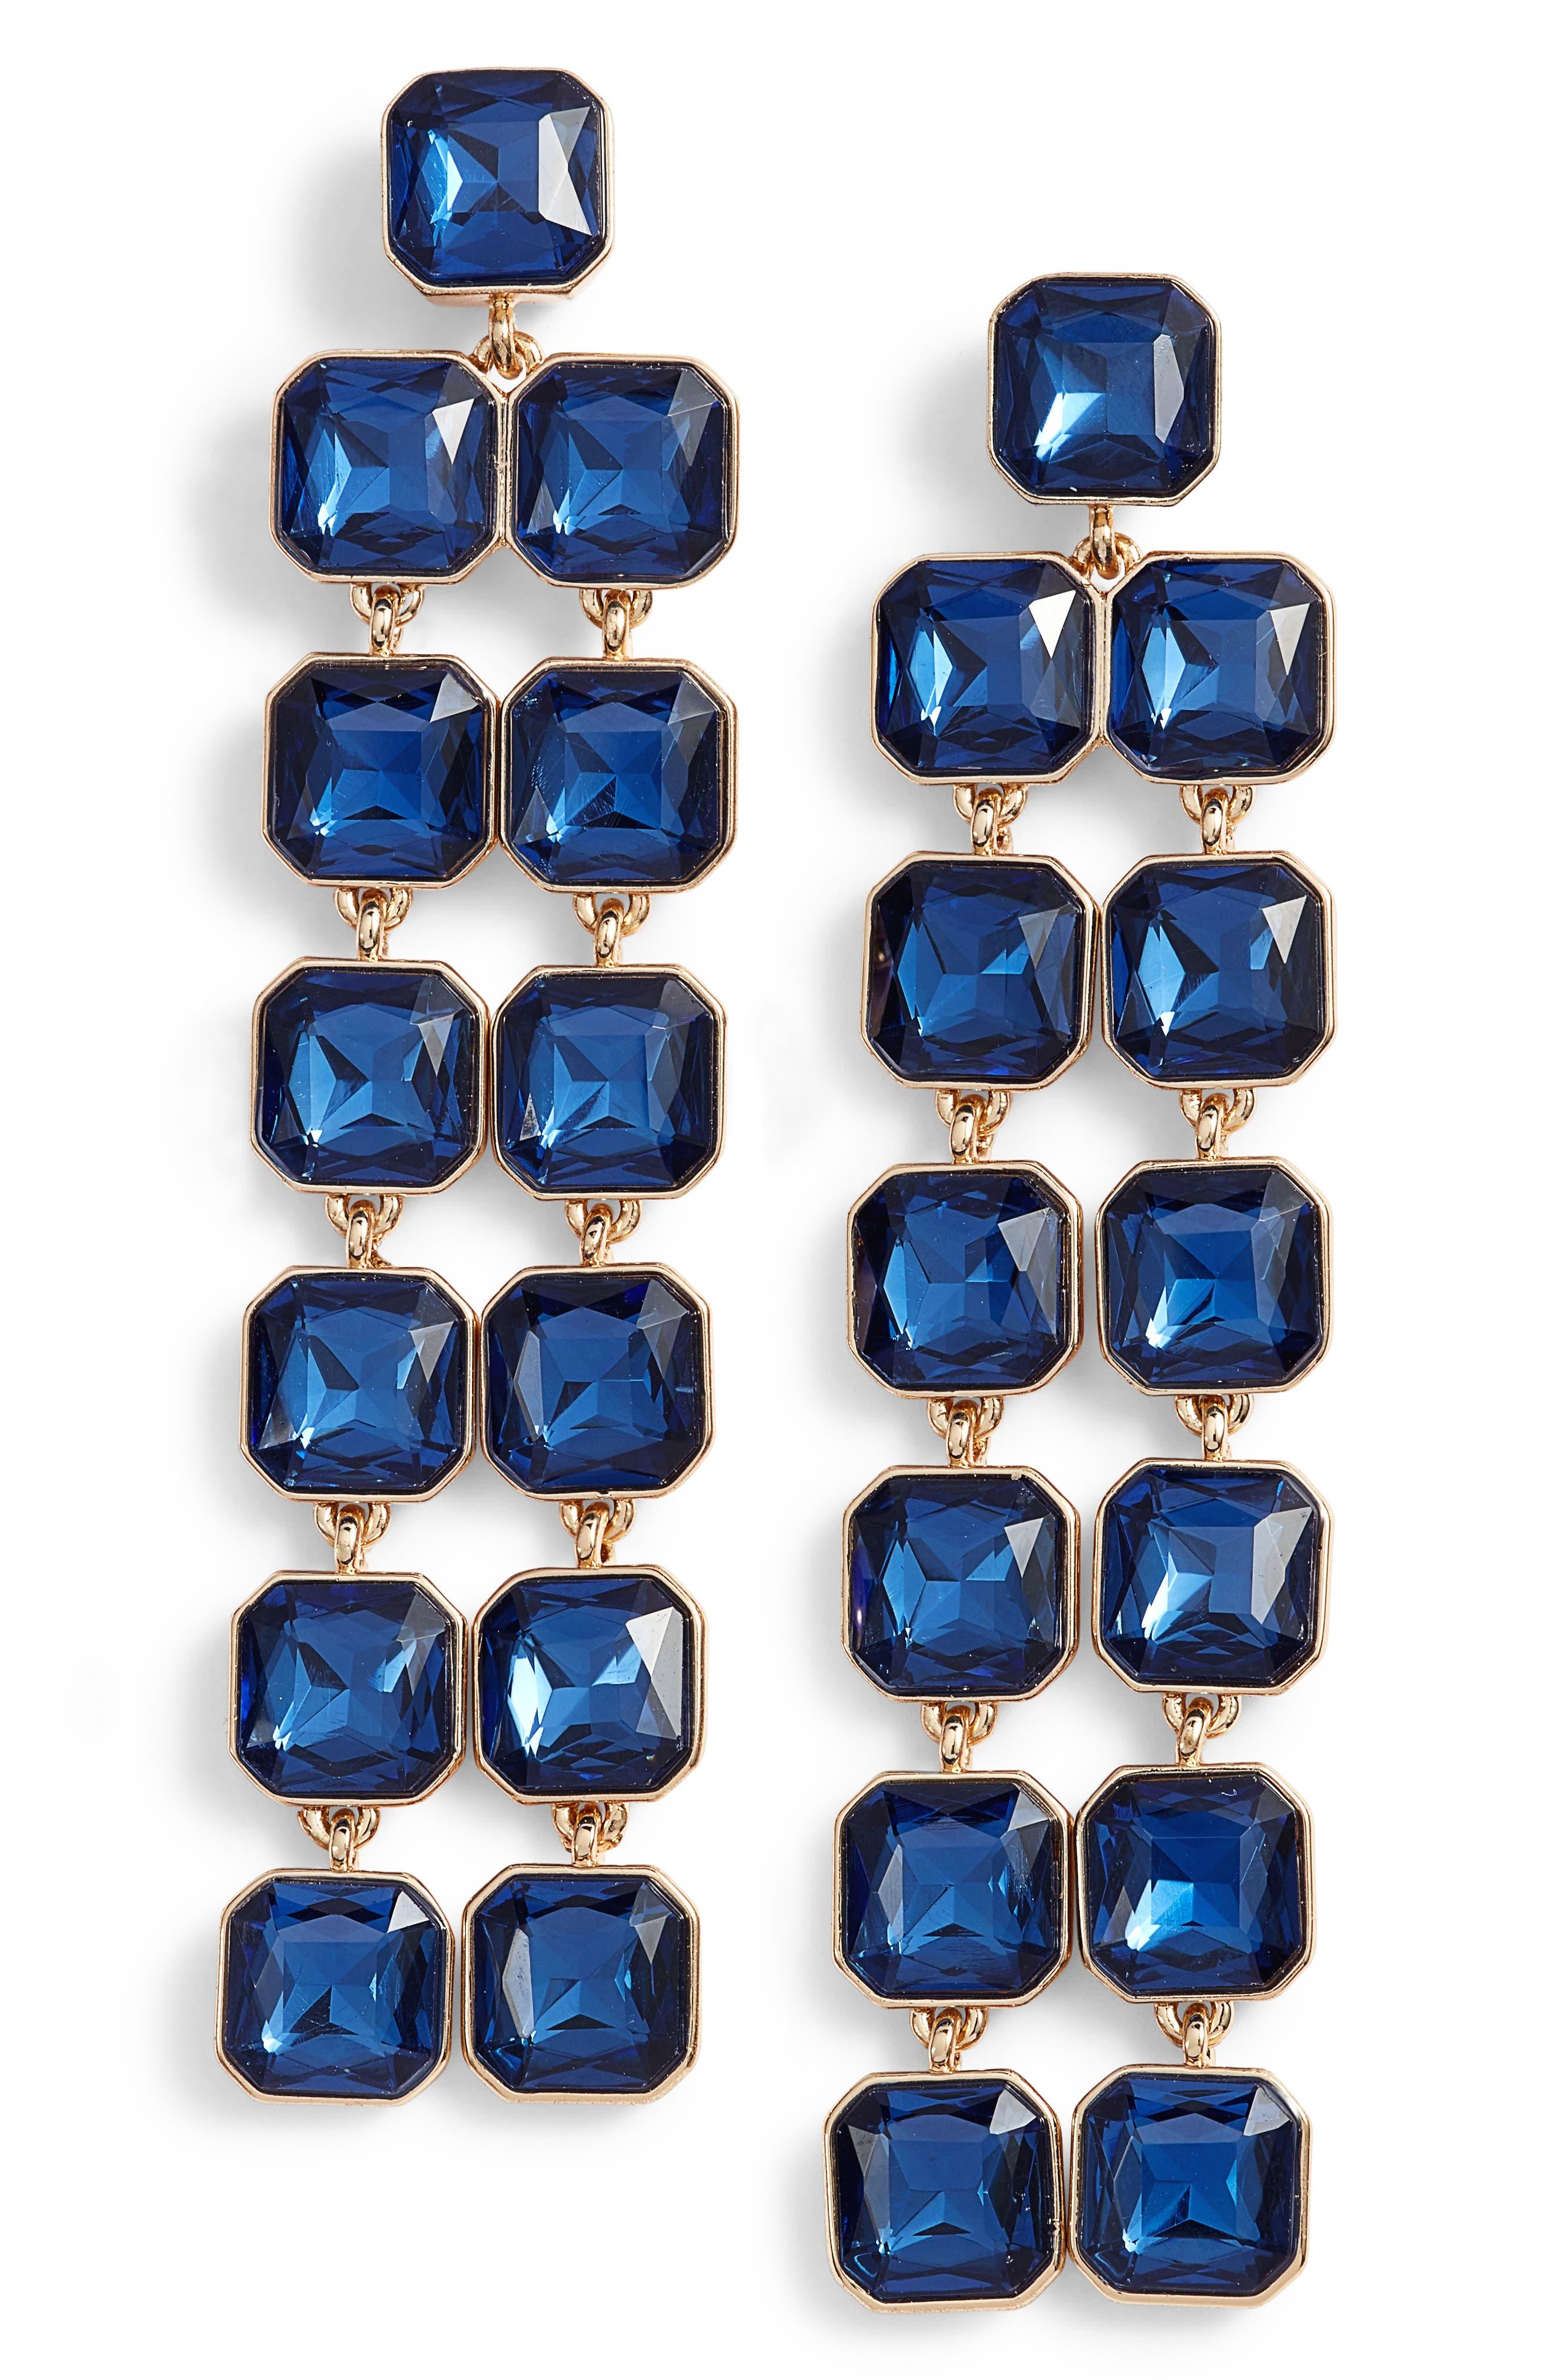 Chandelier Earrings,                             Main thumbnail 1, color,                             400